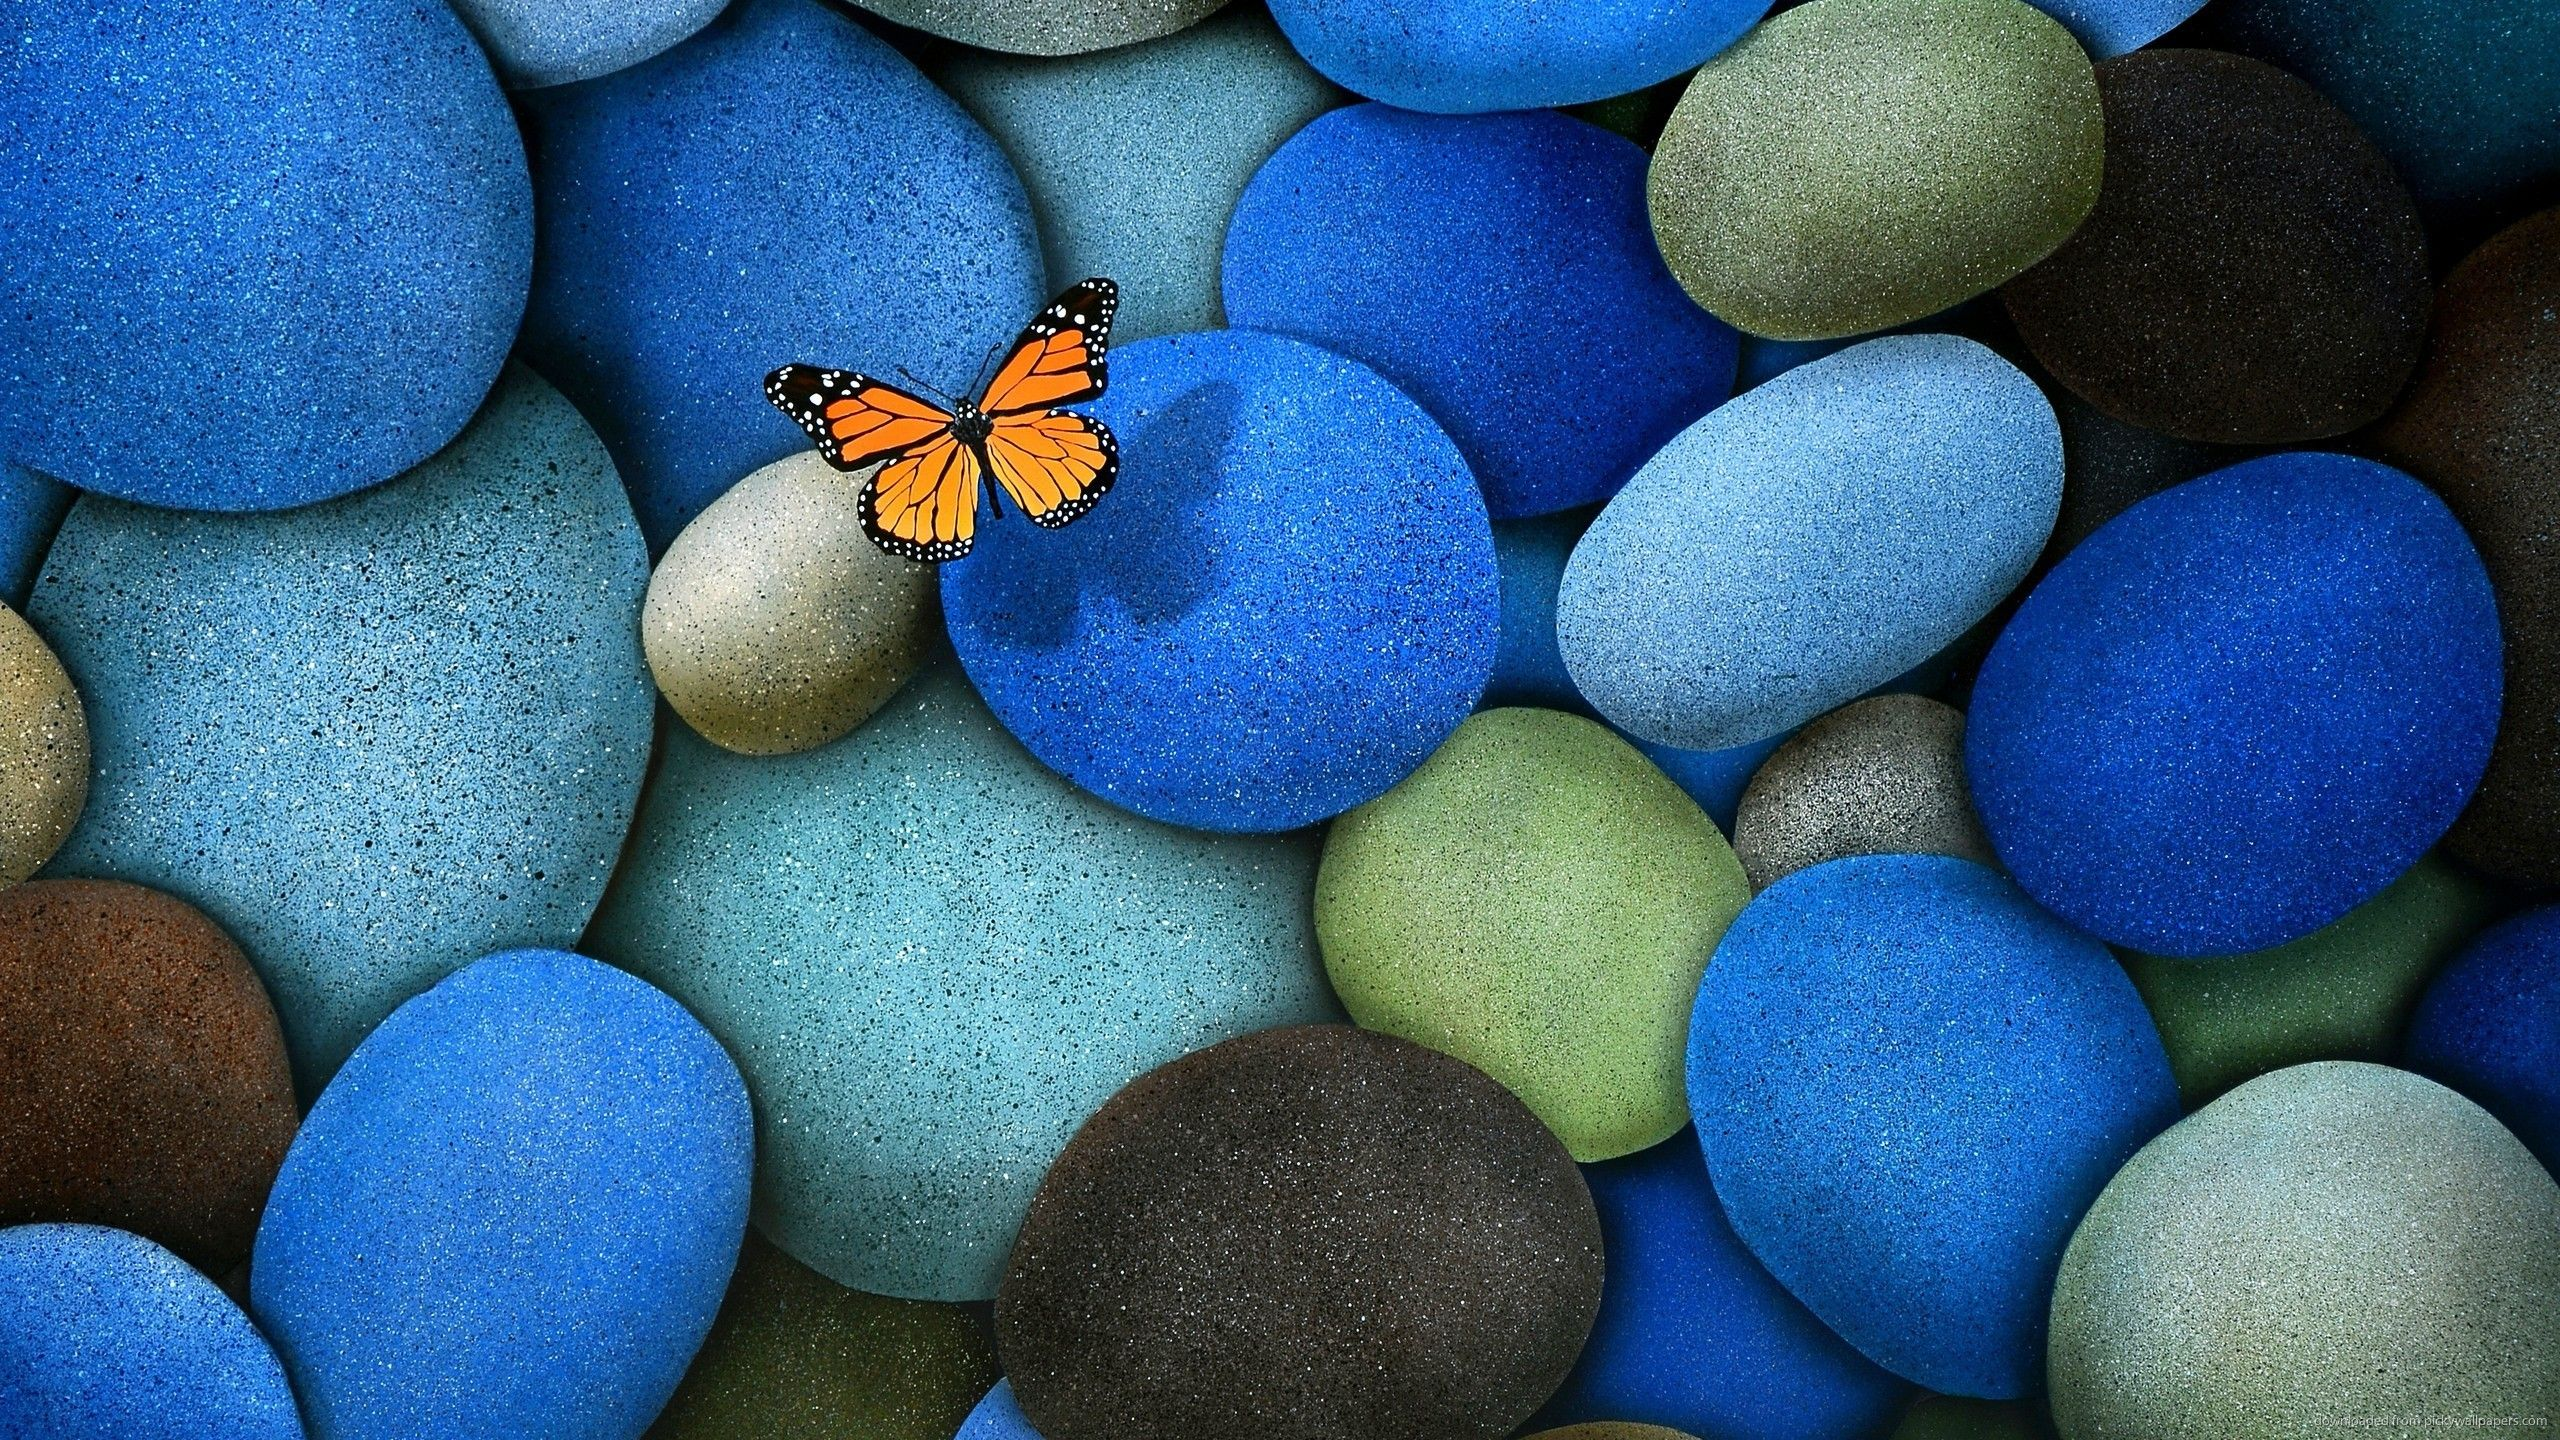 nice pebble hd image  amazingpictcom  wallpapers  pinterest  - wallpaper